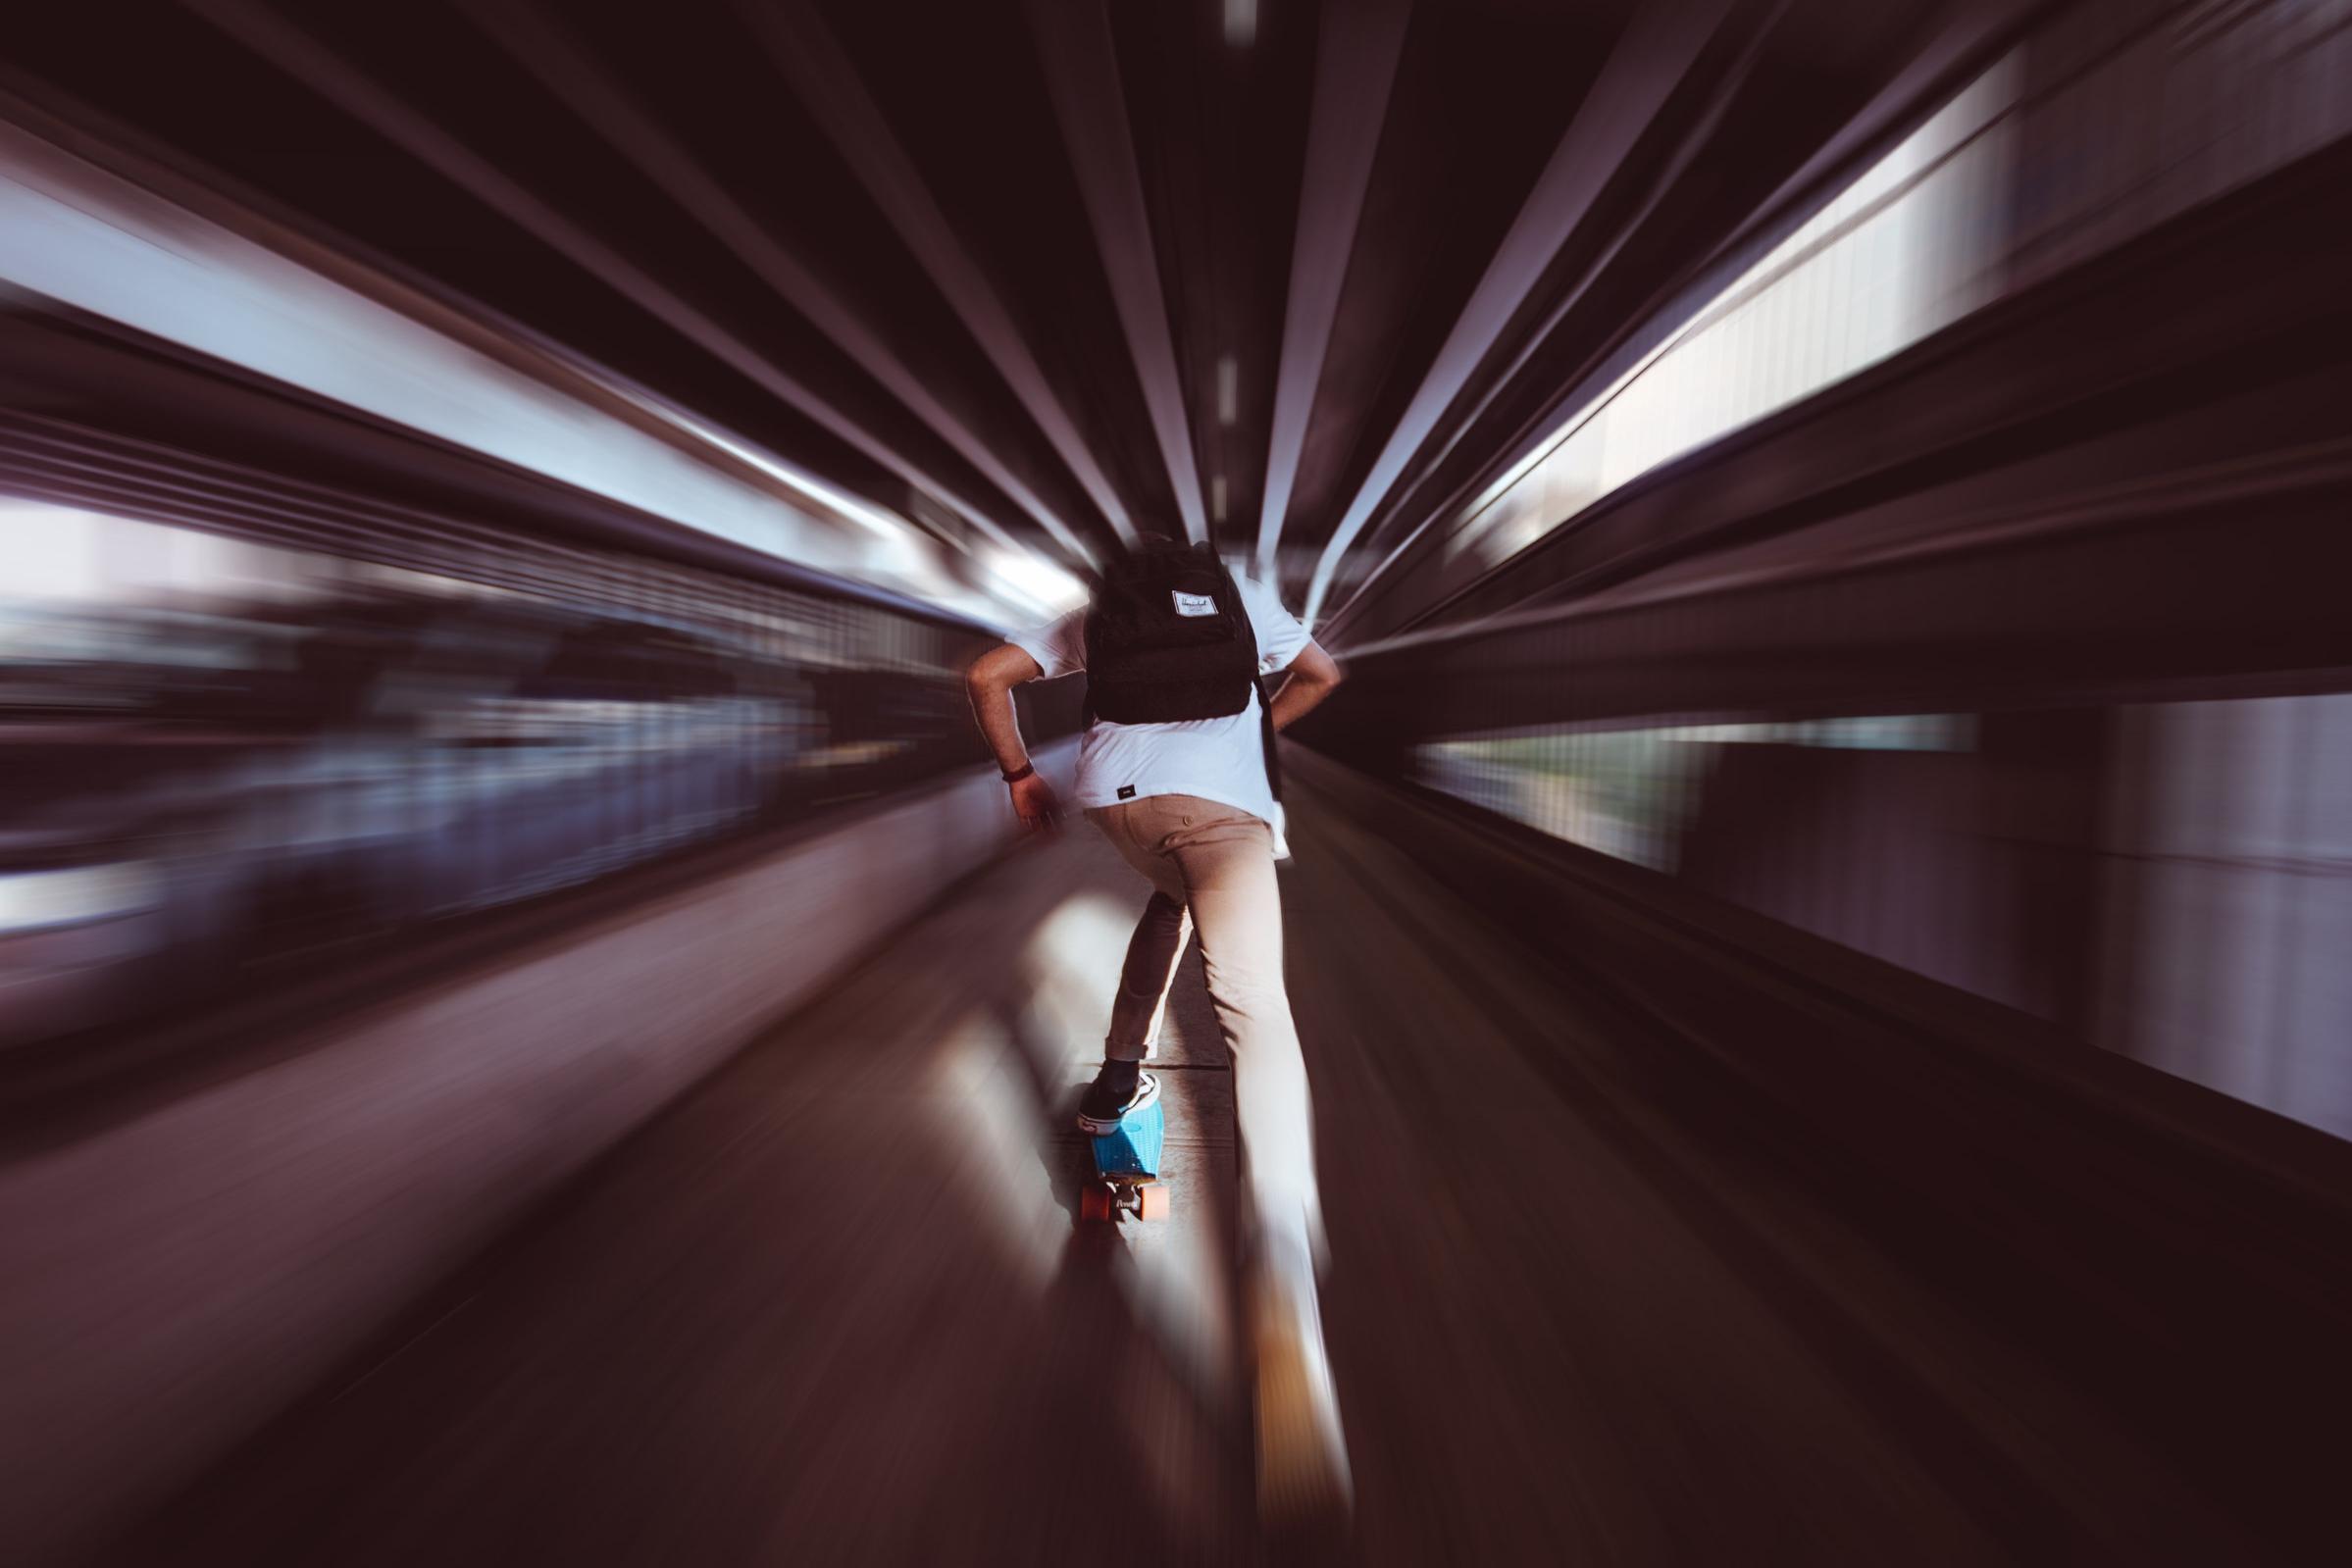 Penny Boards Skateboards